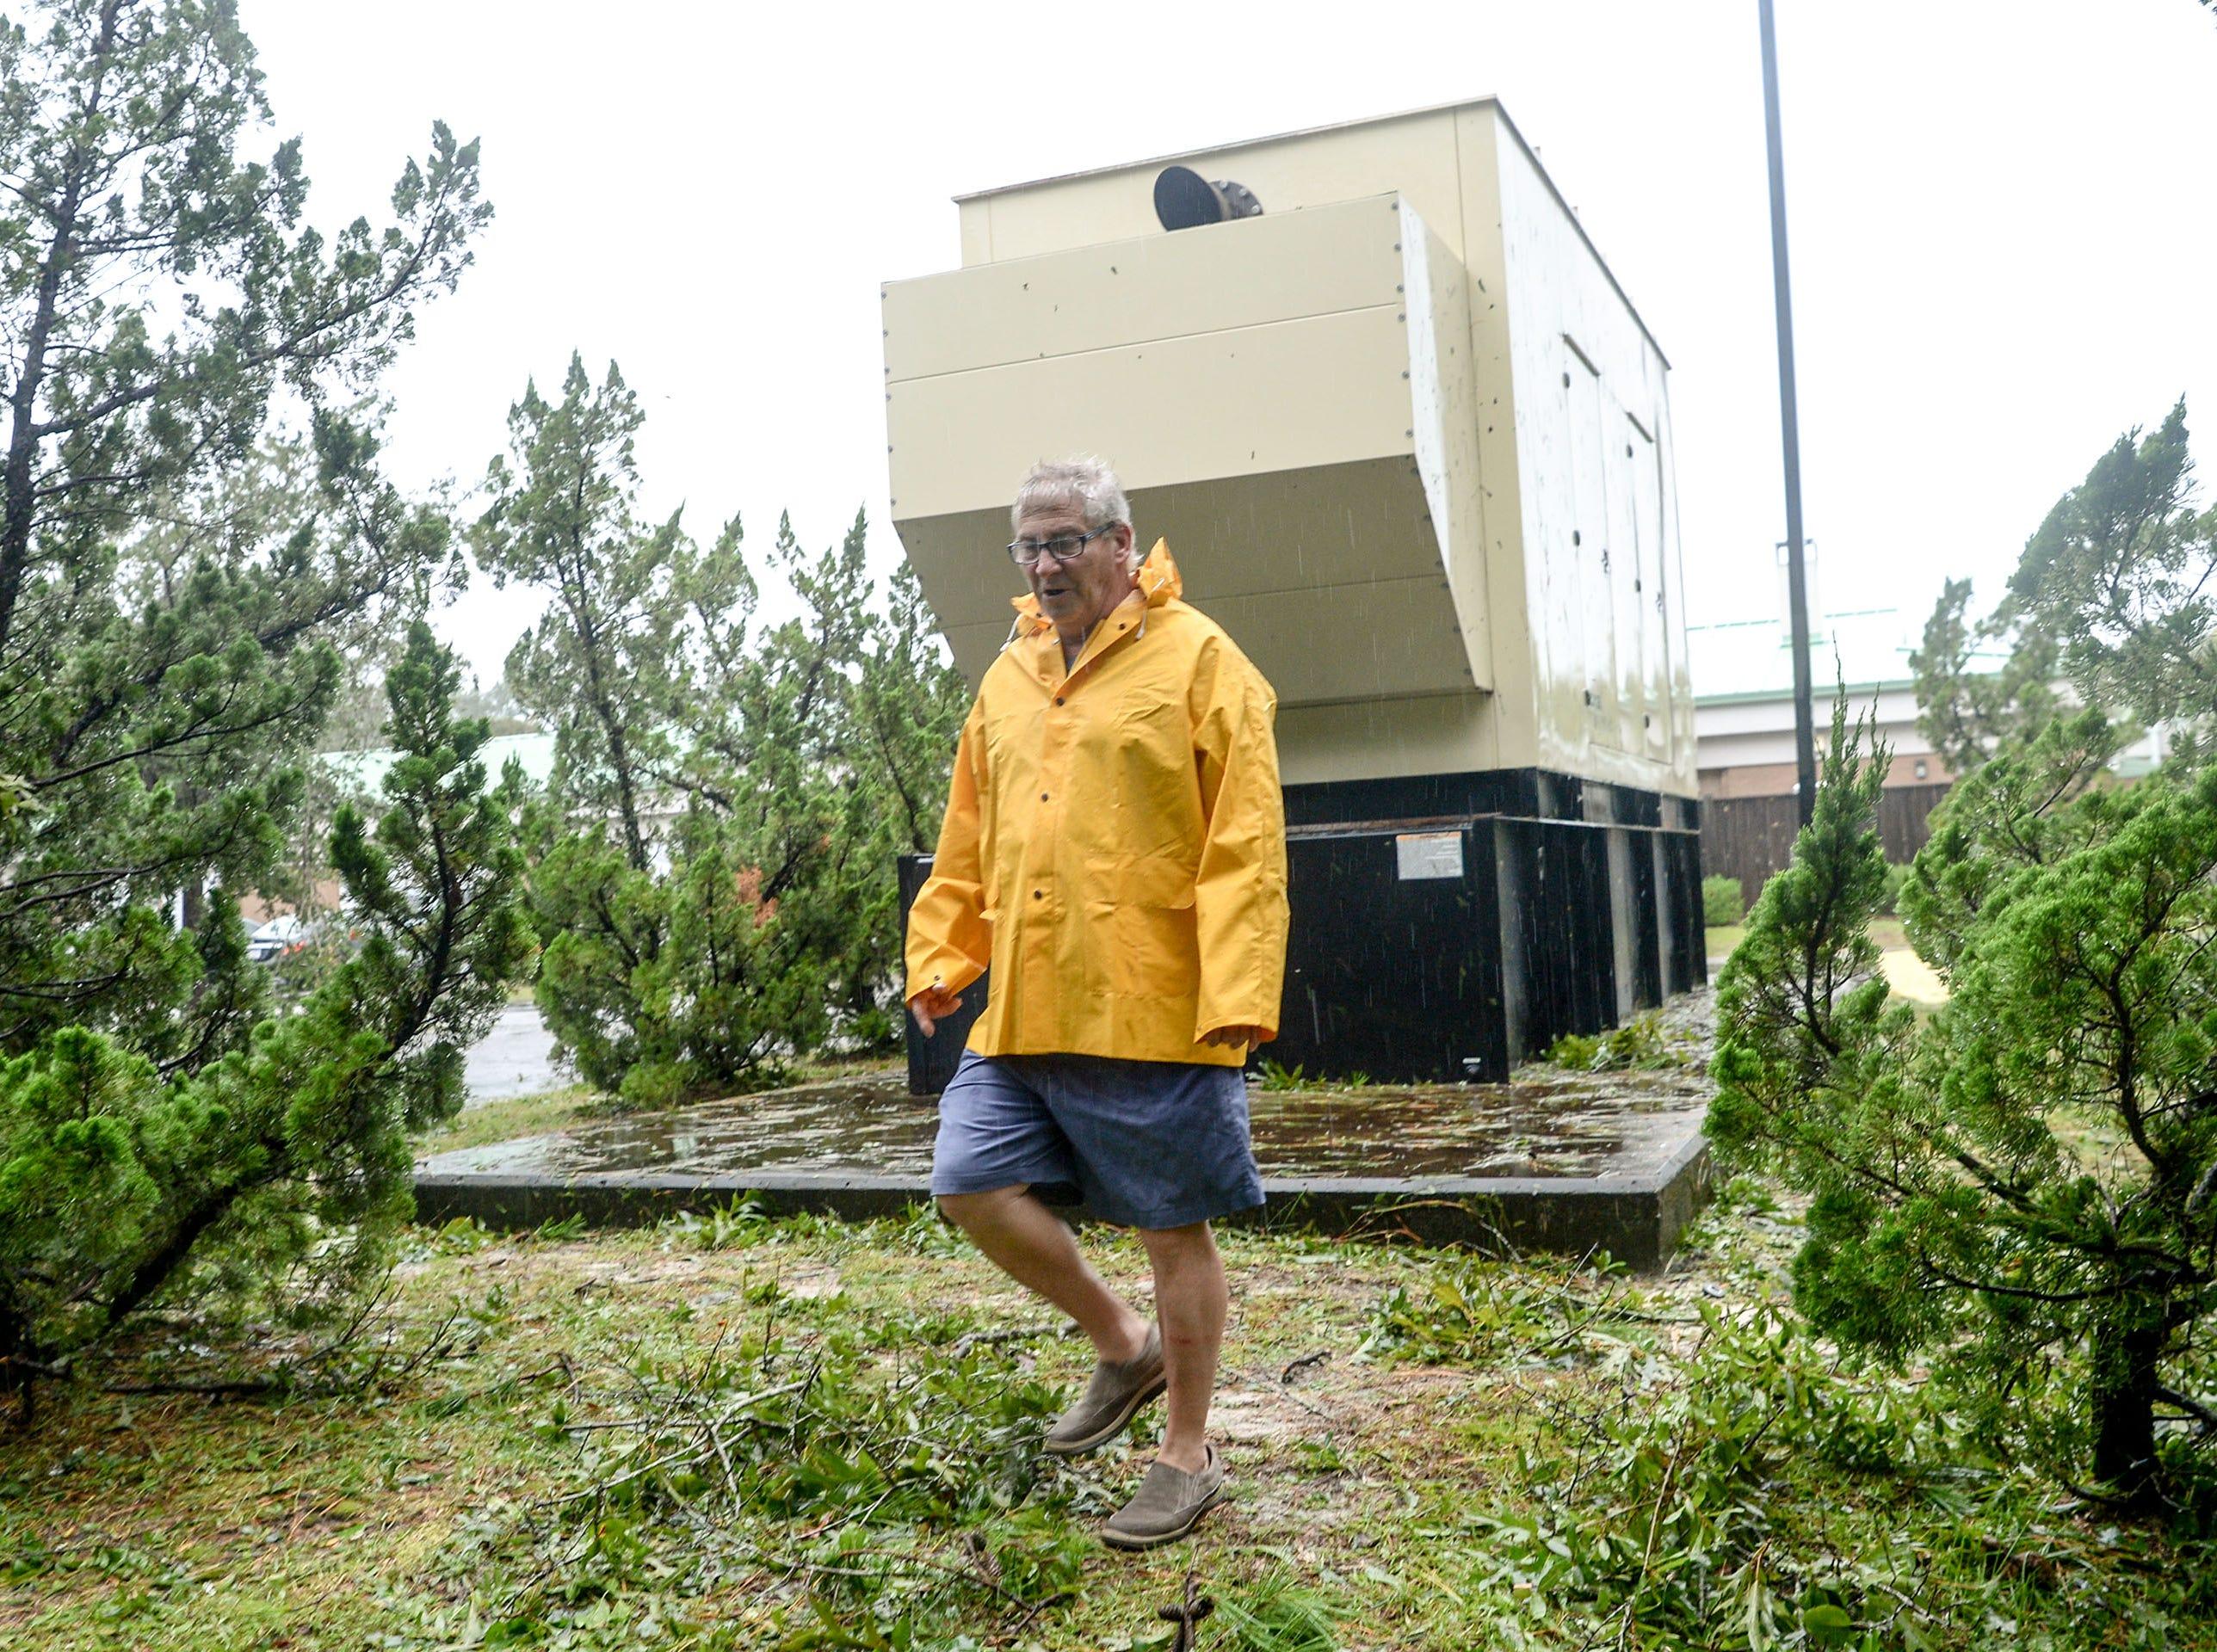 Jeff Winecoff, Facility Maintenance Administrator surveys damage around a generator which went down for 15 hours at The Davis Community nursing home Wilmington, North Carolina, on Saturday, September 15, 2018. (Ken Ruinard / Greenville News / Gannett USA Today Network / 2018 )